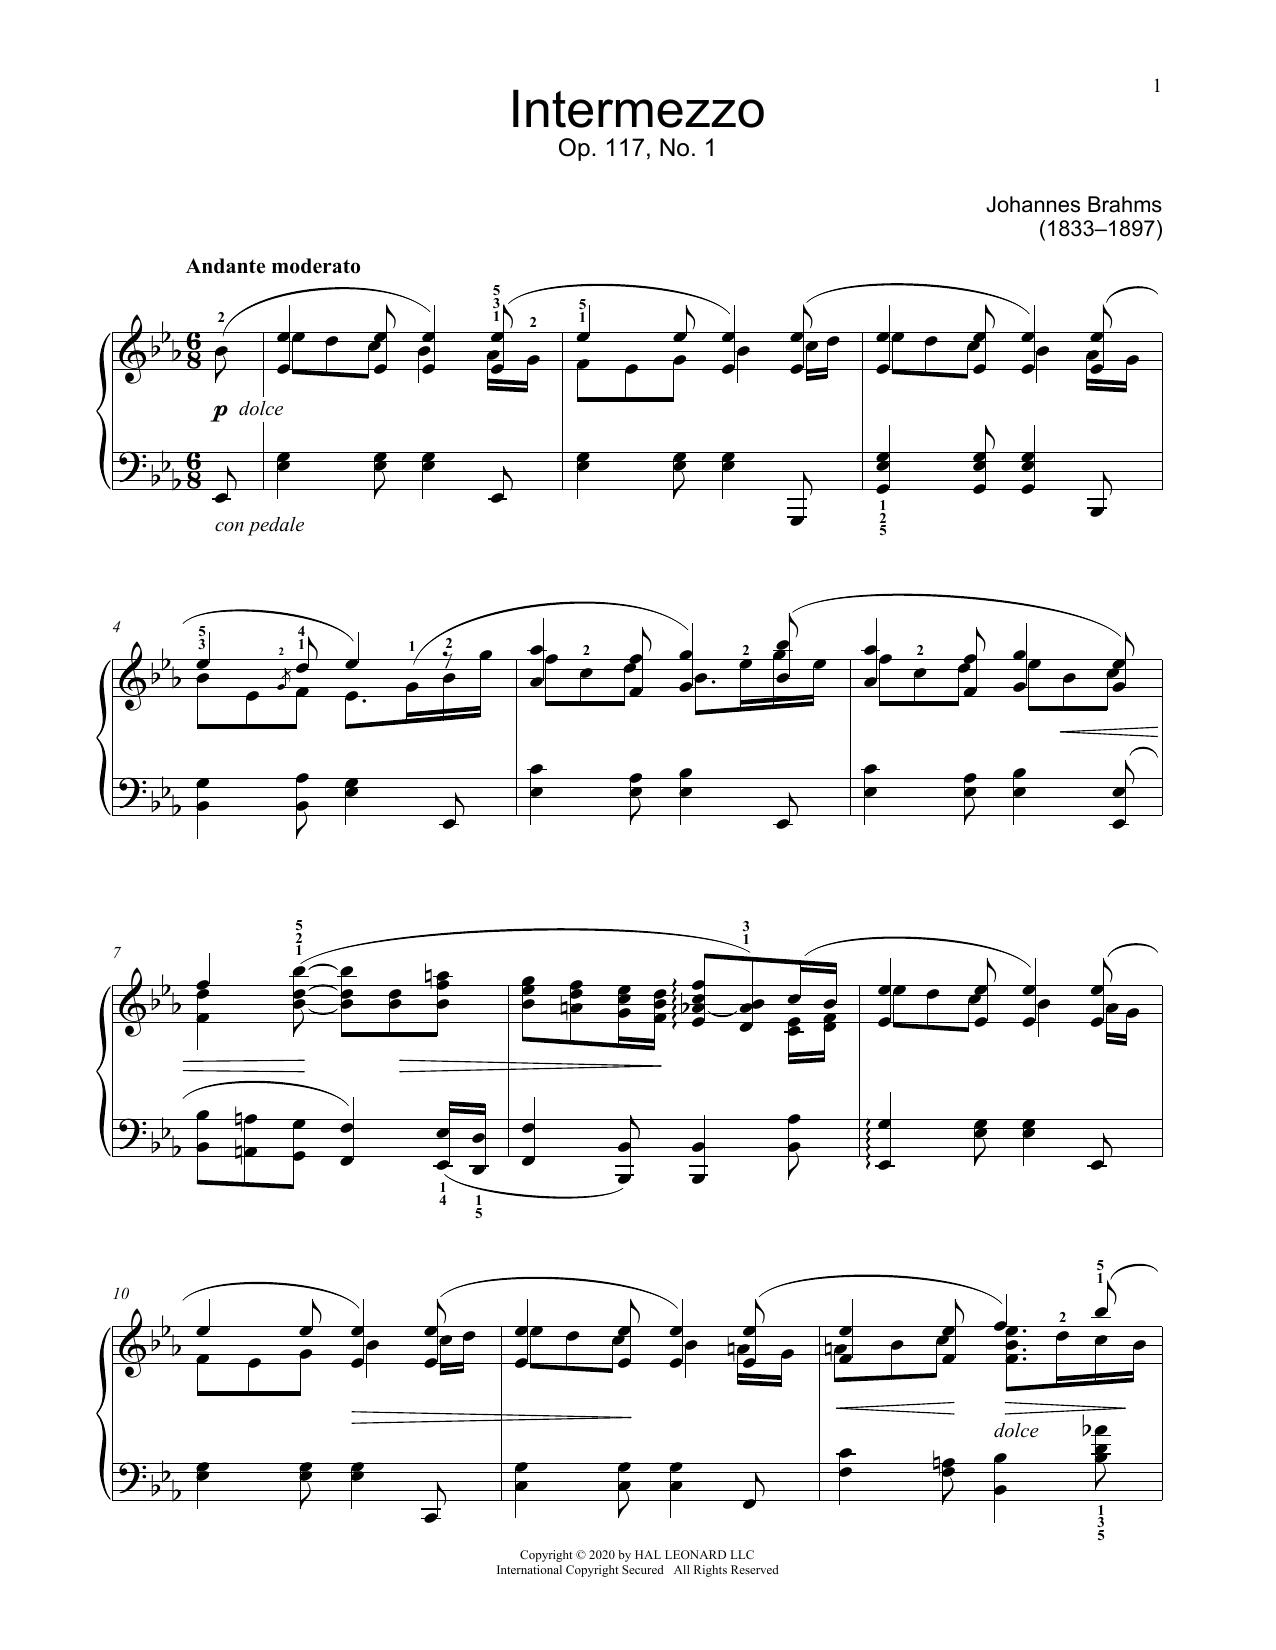 Intermezzo, Op. 117, No. 1 Sheet Music